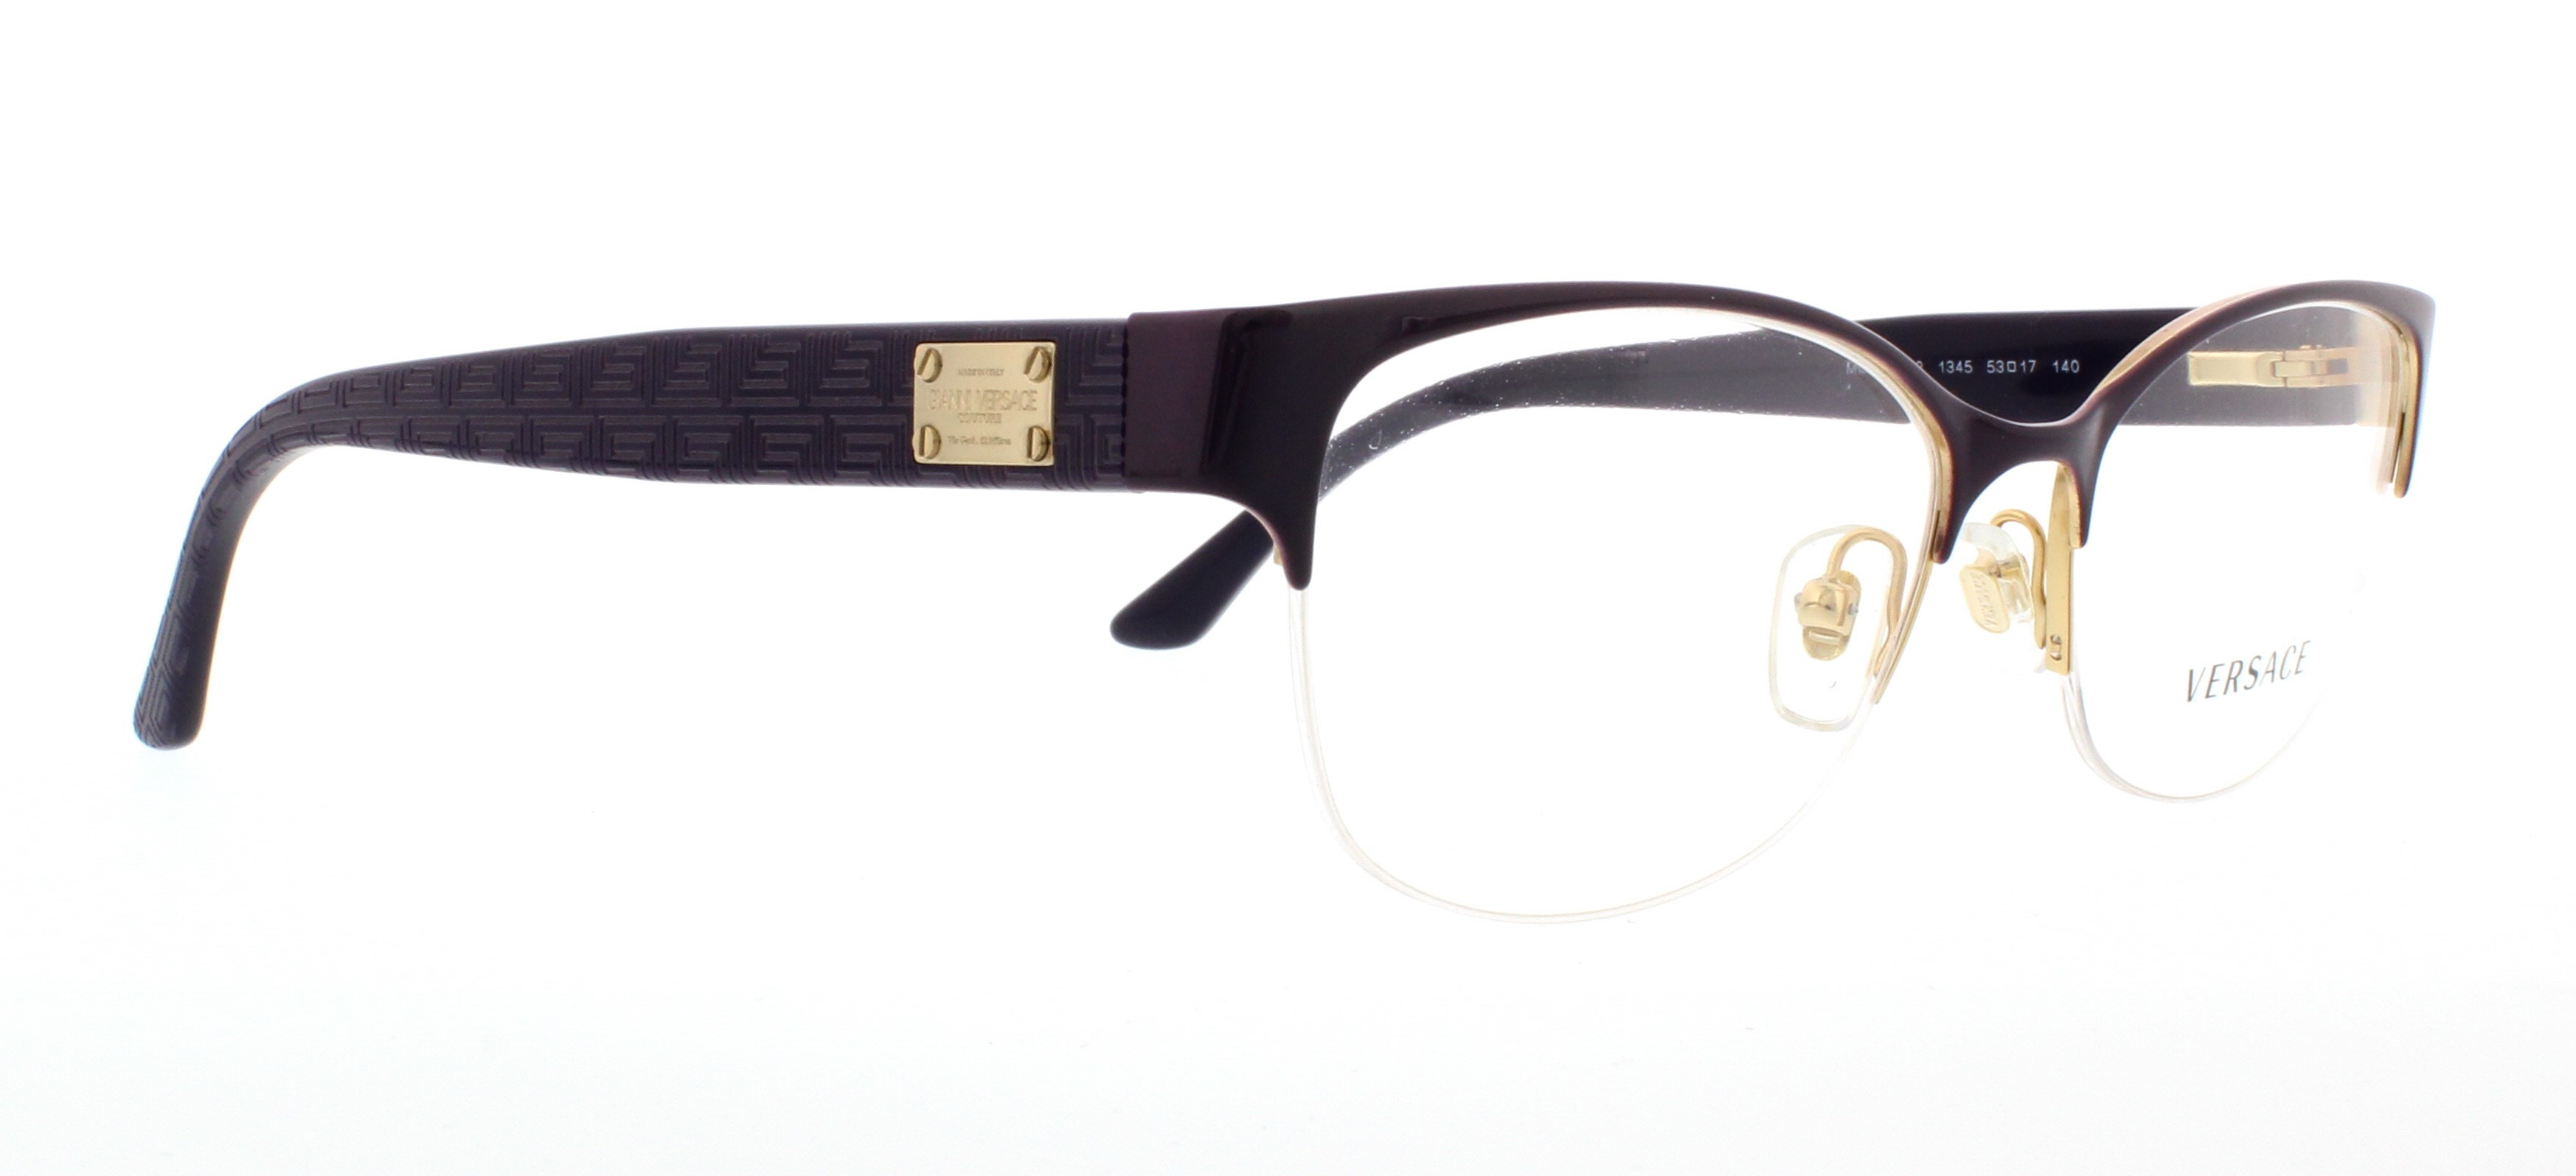 4bdc05d4e1 VERSACE Eyeglasses VE 1222 1345 Gold 53MM - Walmart.com